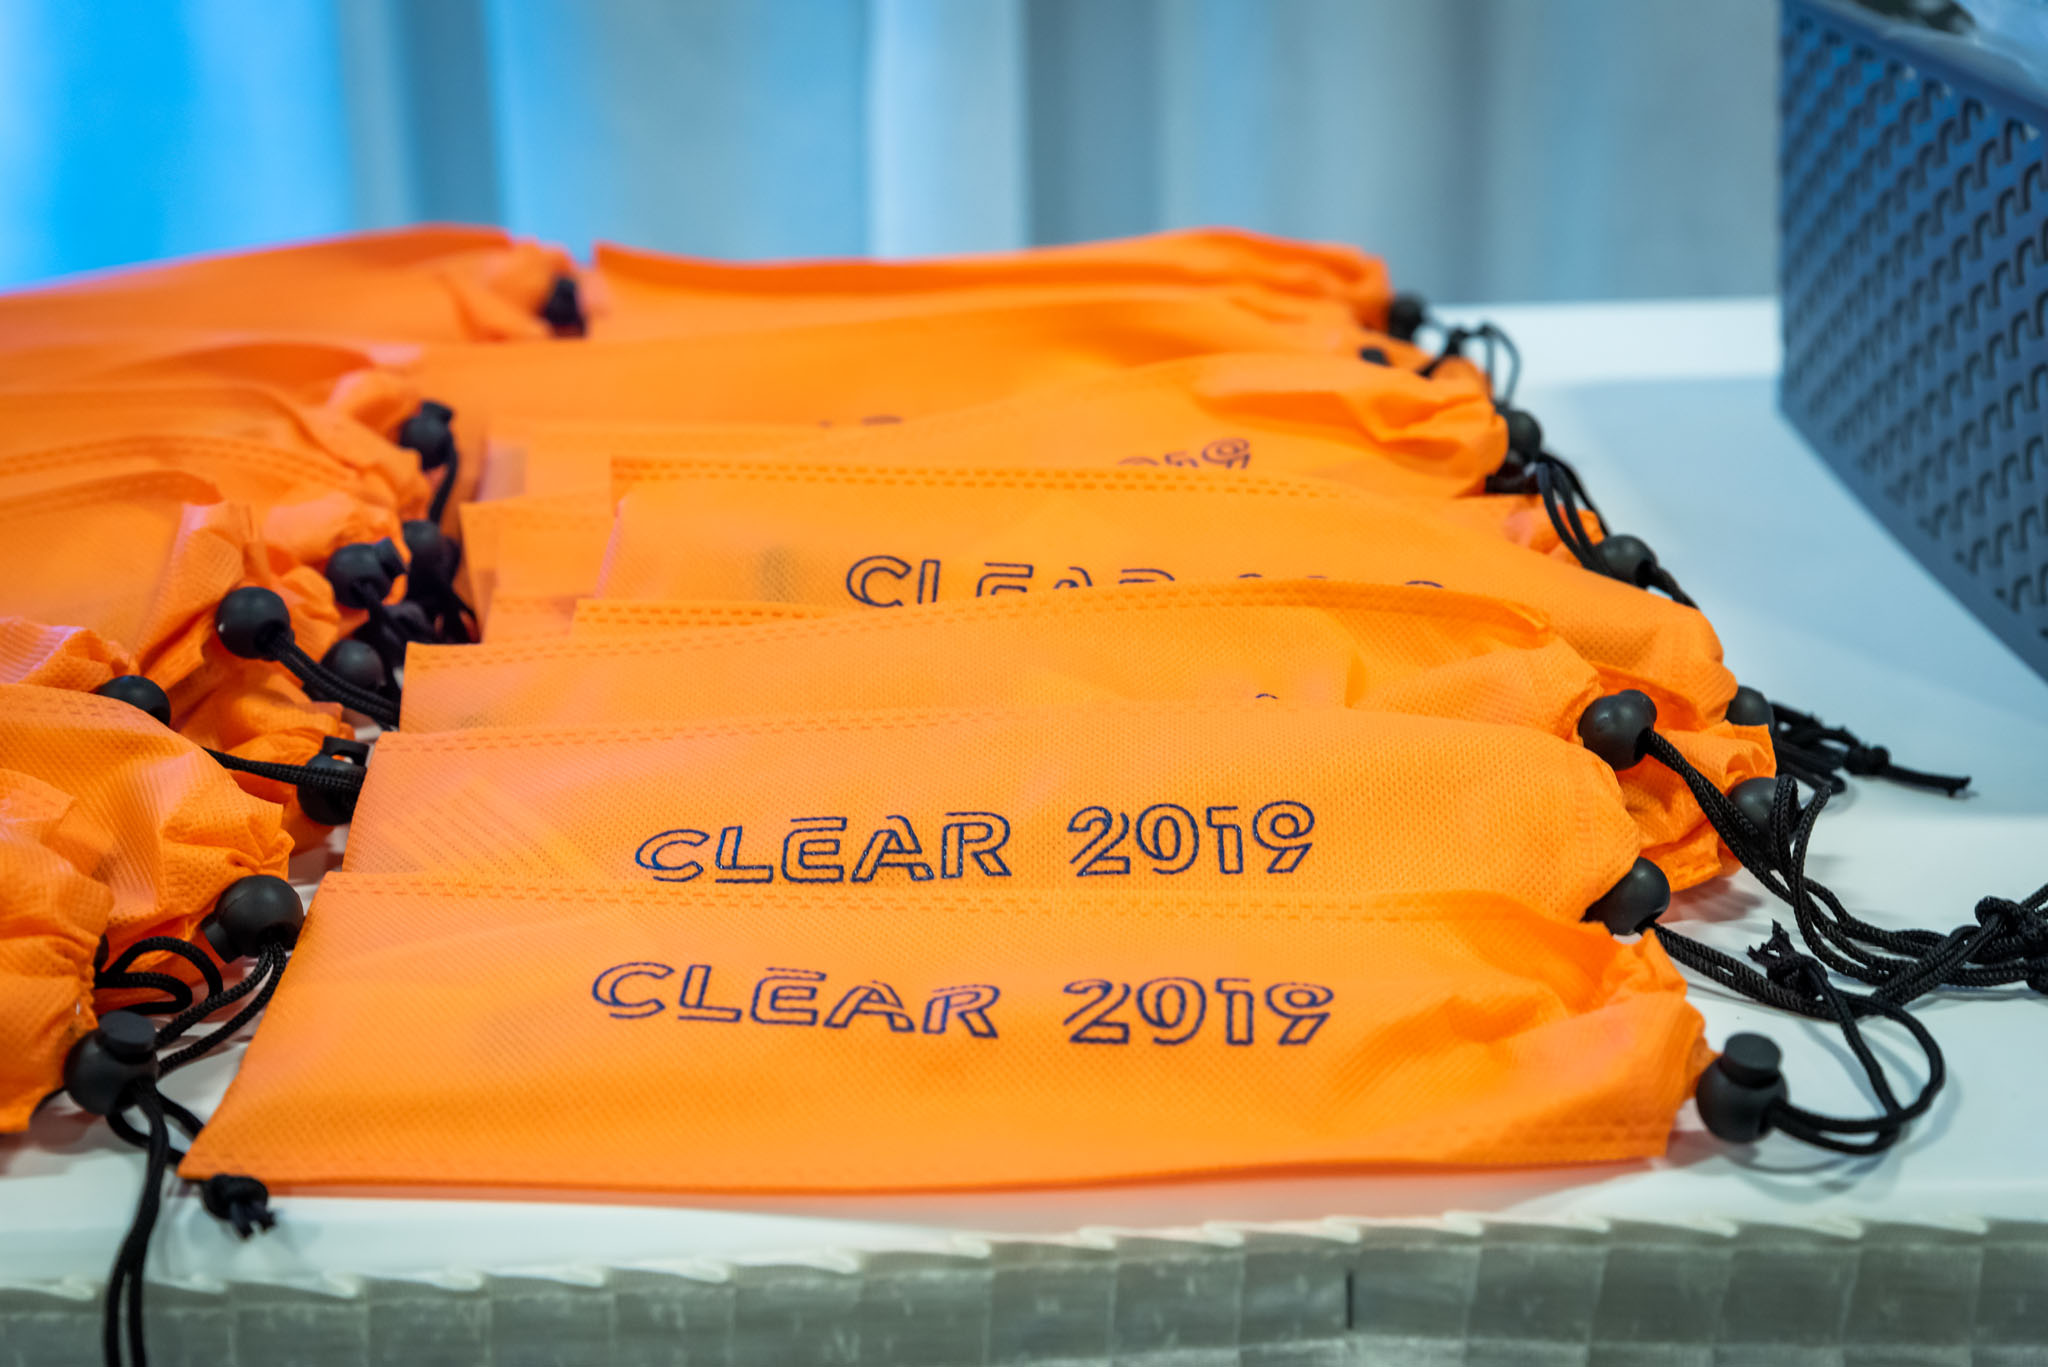 Cherwell_Clear_2019_285.jpg